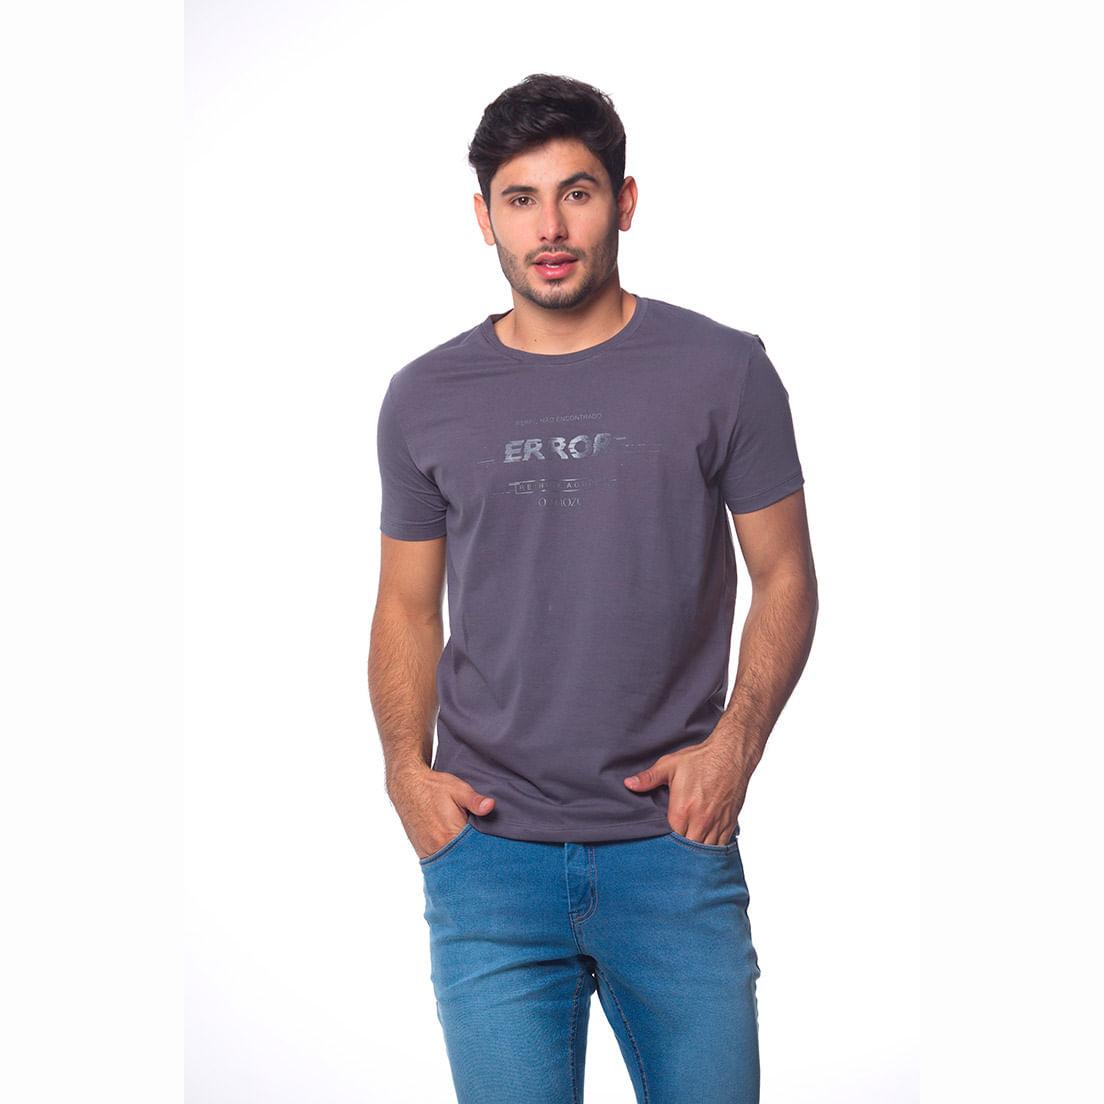 Camiseta Osmoze Error 110112856 Cinza